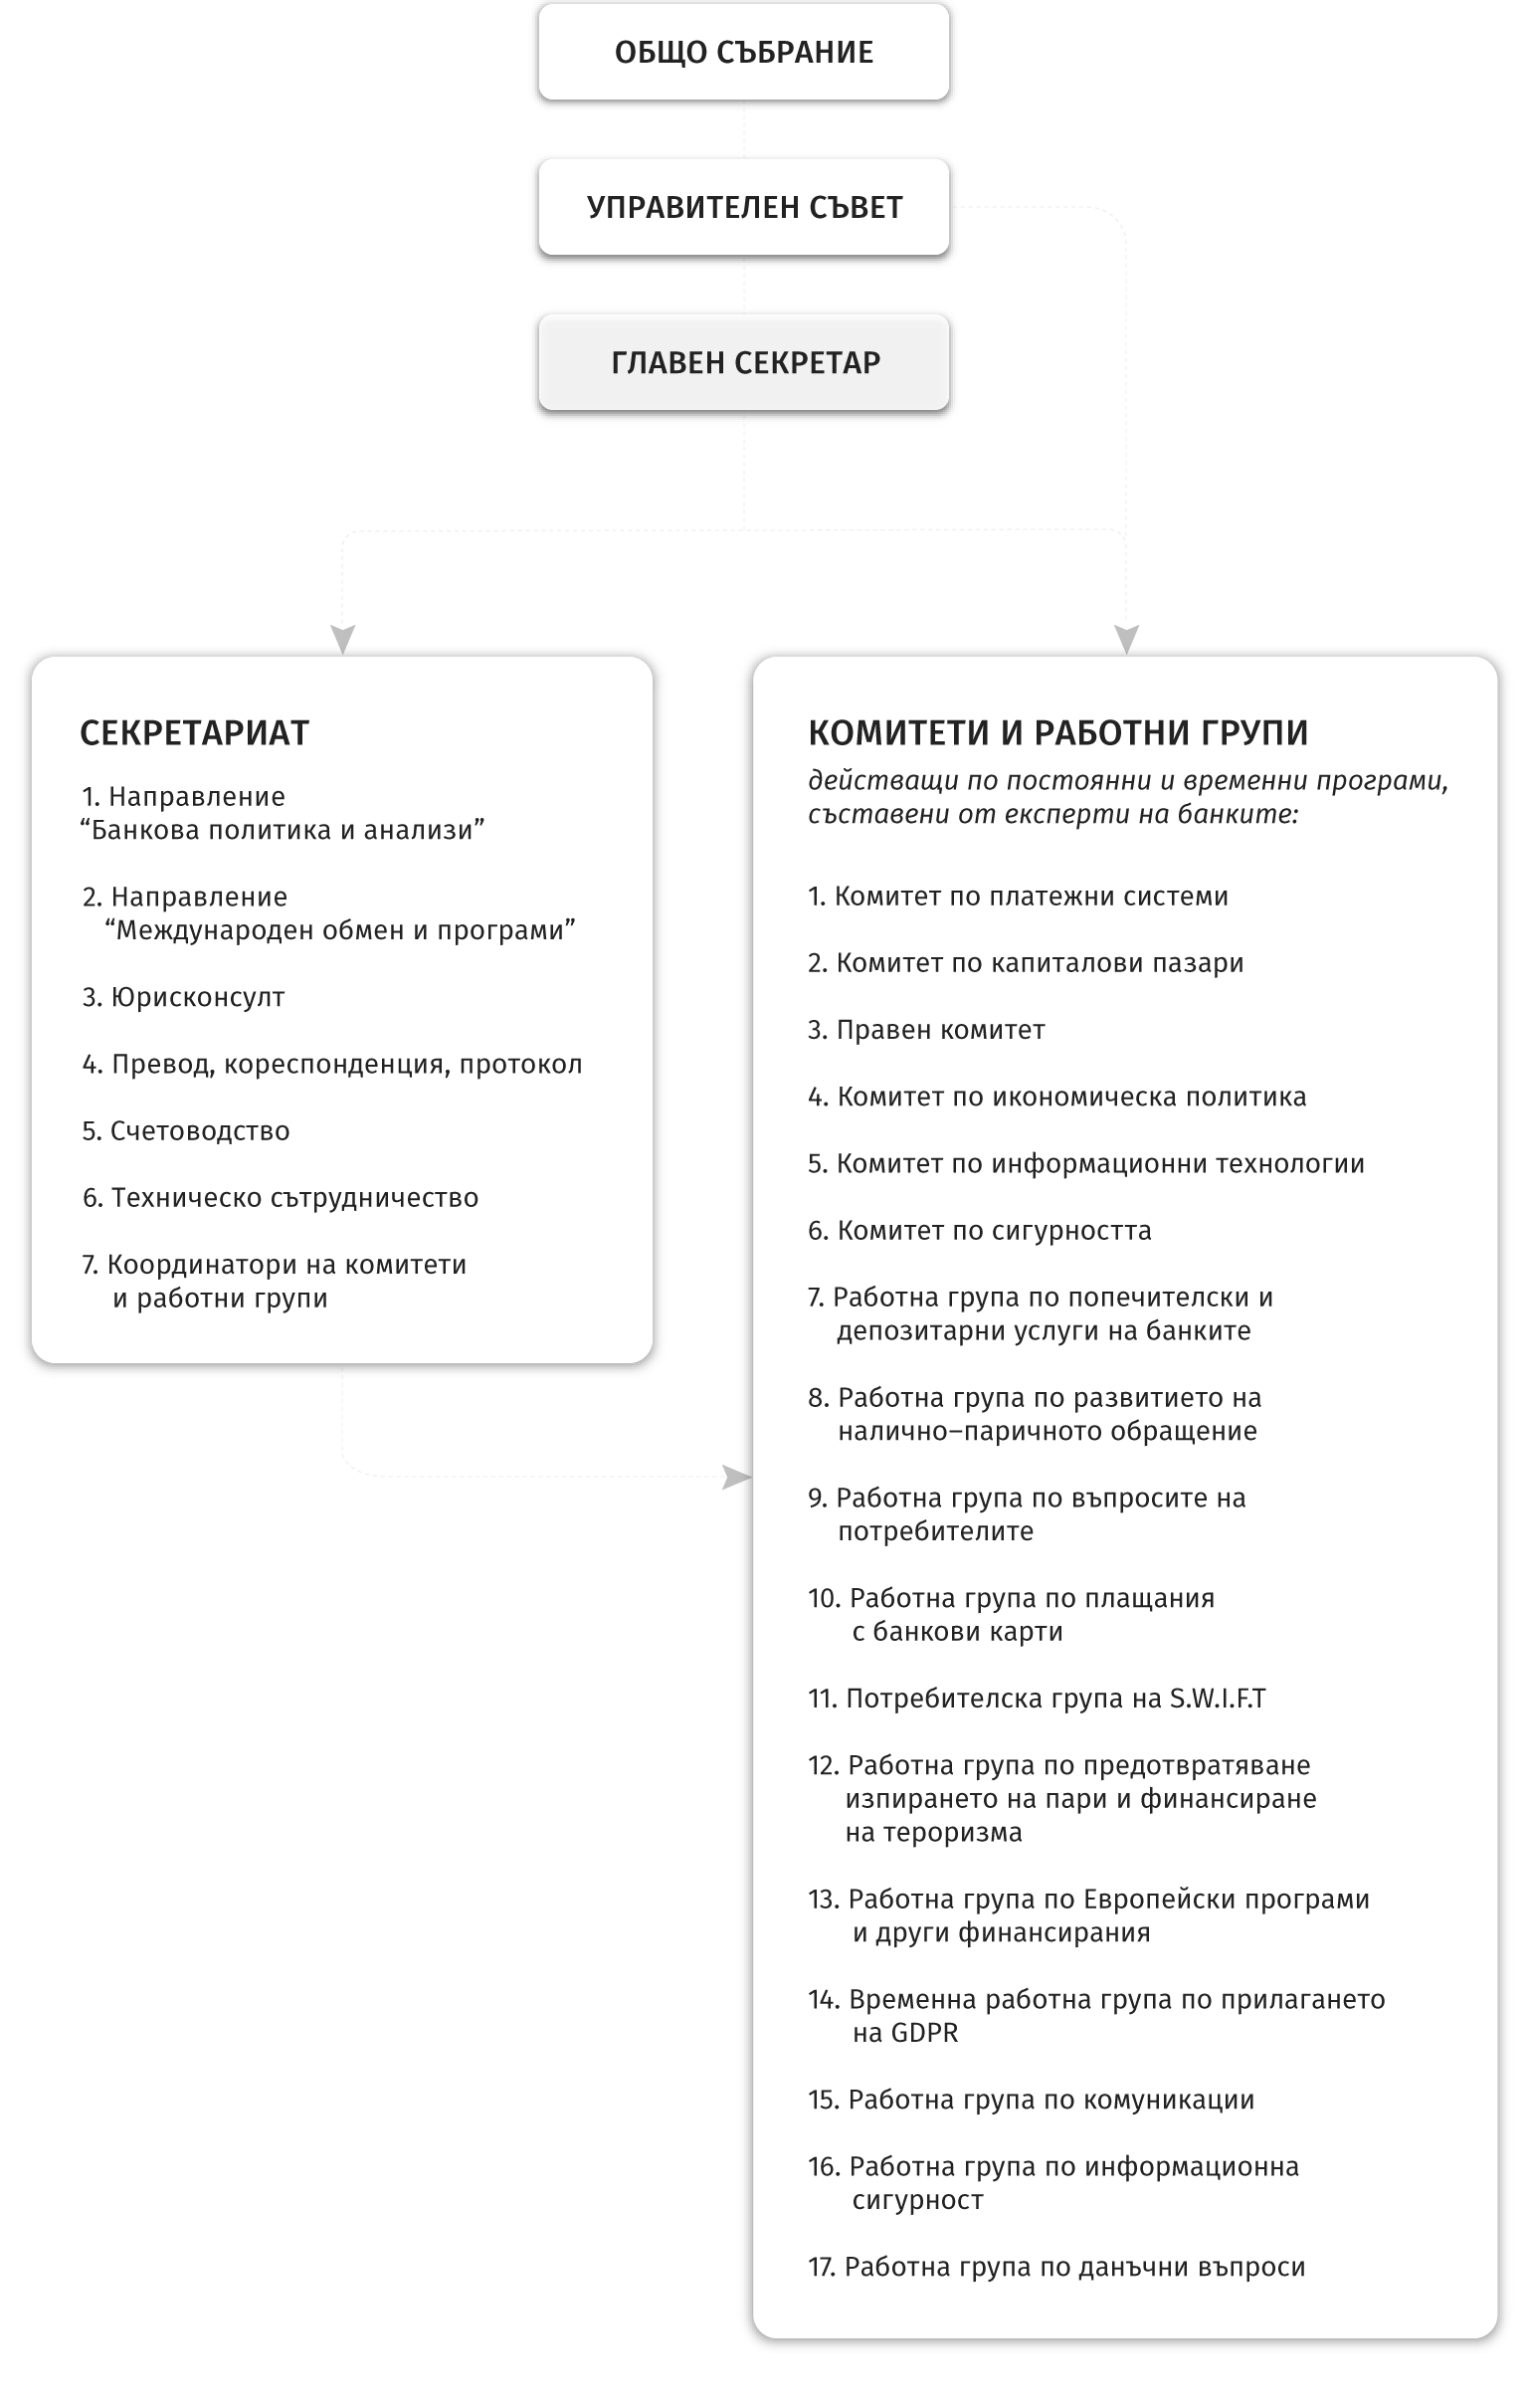 Организационна структура на АББ